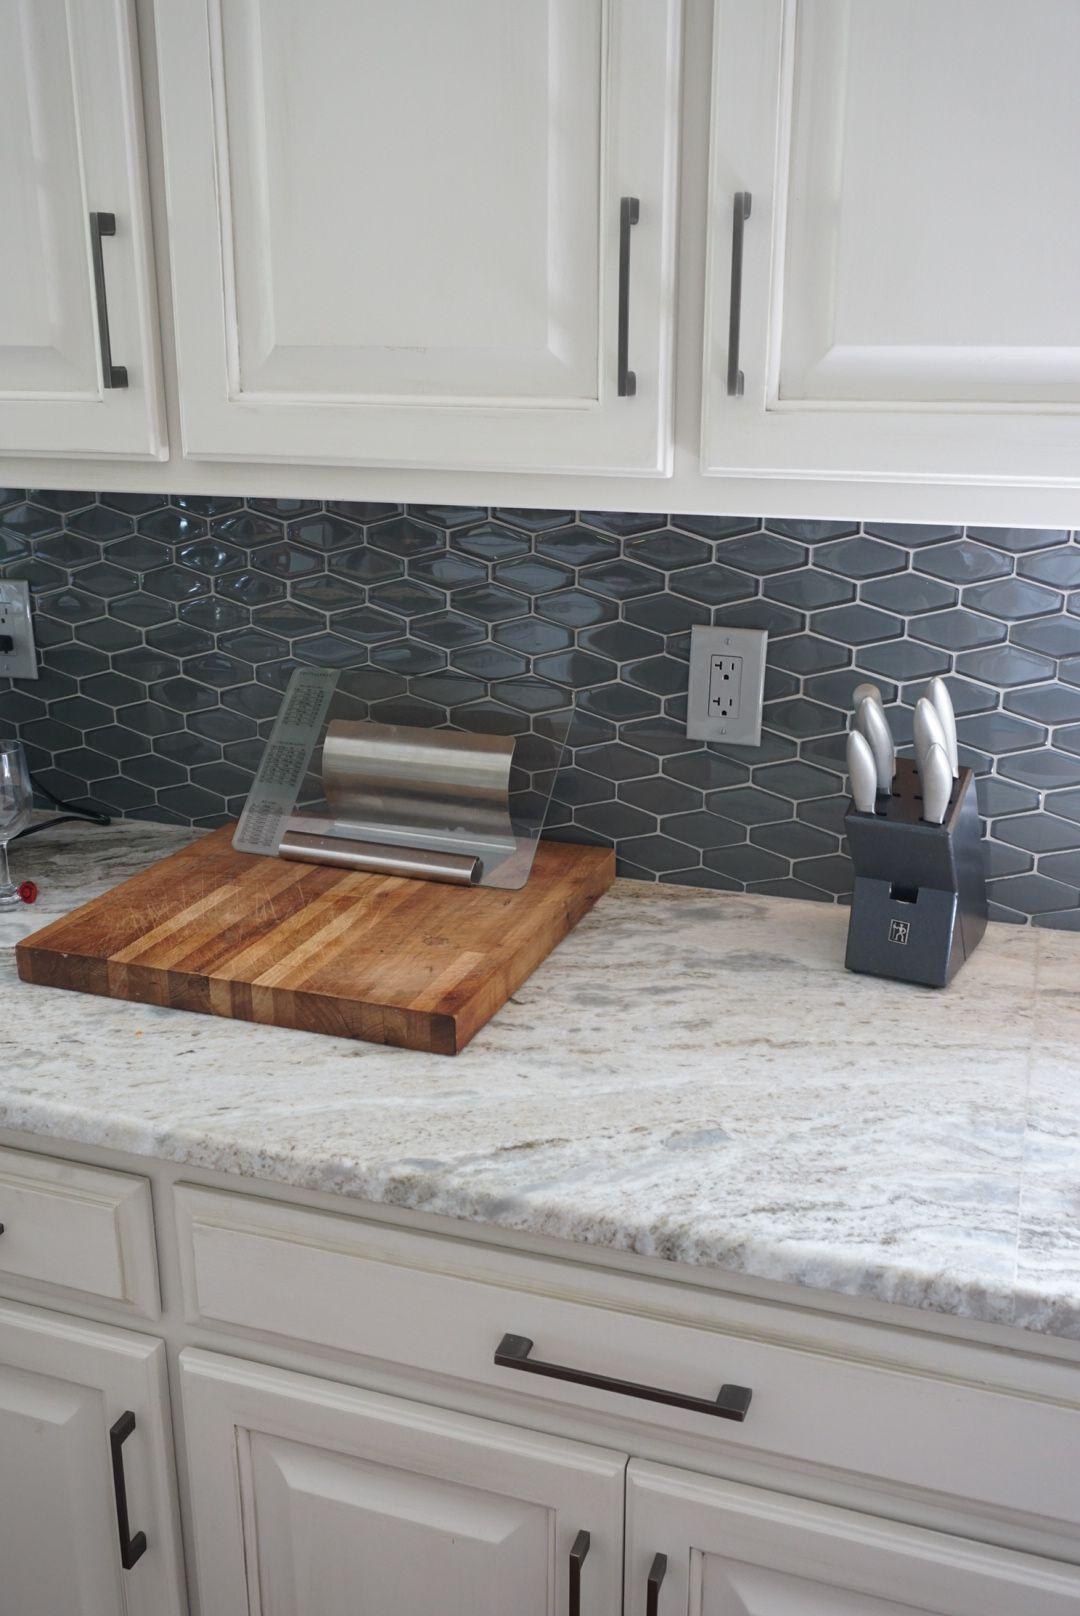 Amazing And Unique Ideas Can Change Your Life Granite Backsplash Combinations Granite Countertops Kitchen Kitchen Tiles Backsplash Outdoor Kitchen Countertops